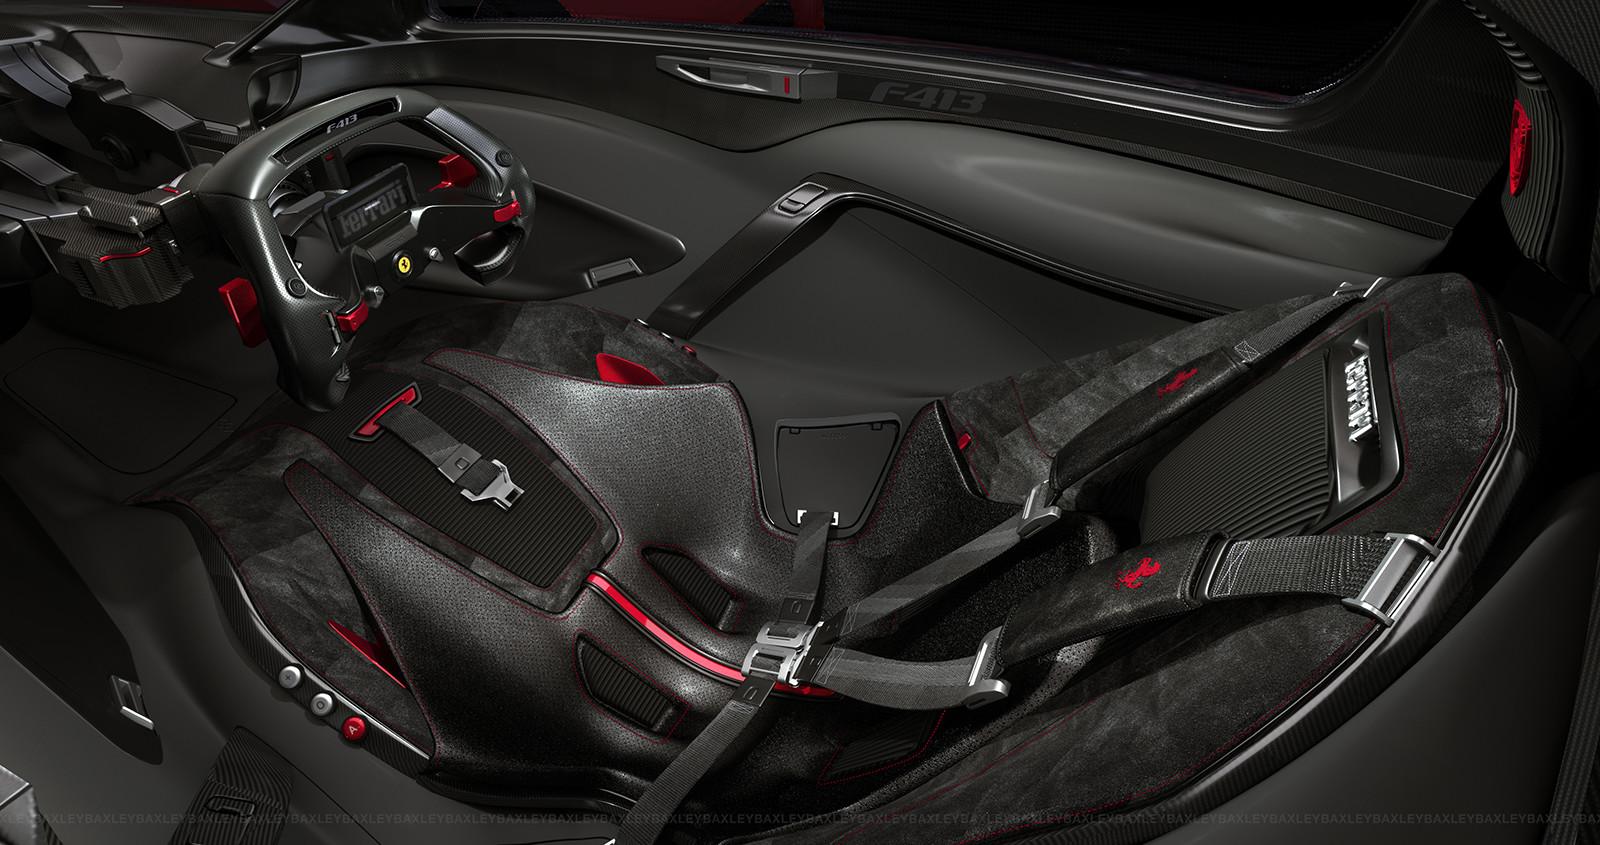 Shane baxley 042418 f413 interior v1 2 octane baxley lorez